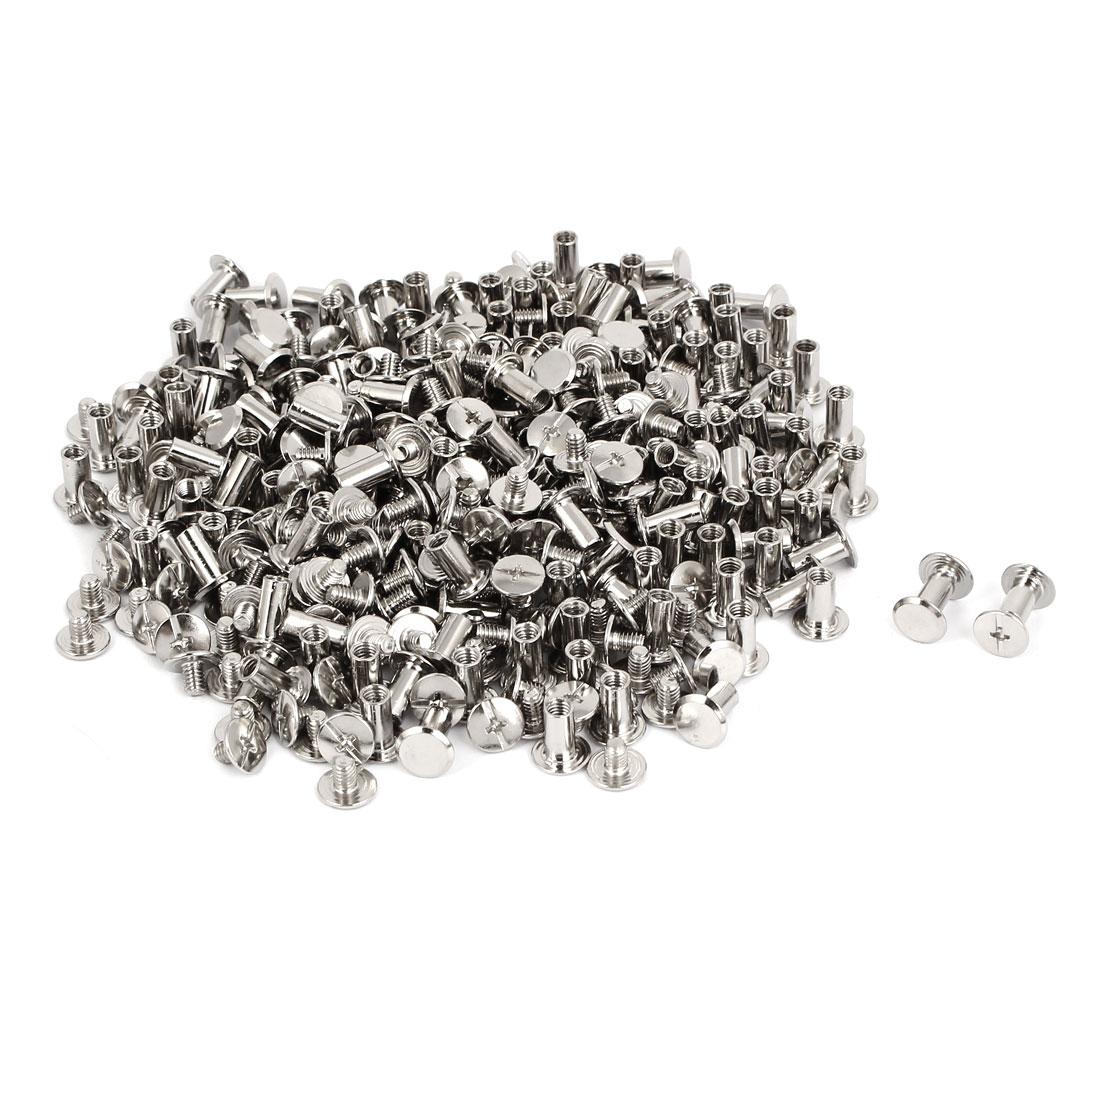 M5x10mm Photo Albums Scrapbook Metal Binding Screw Post Silver Tone 200 Pcs